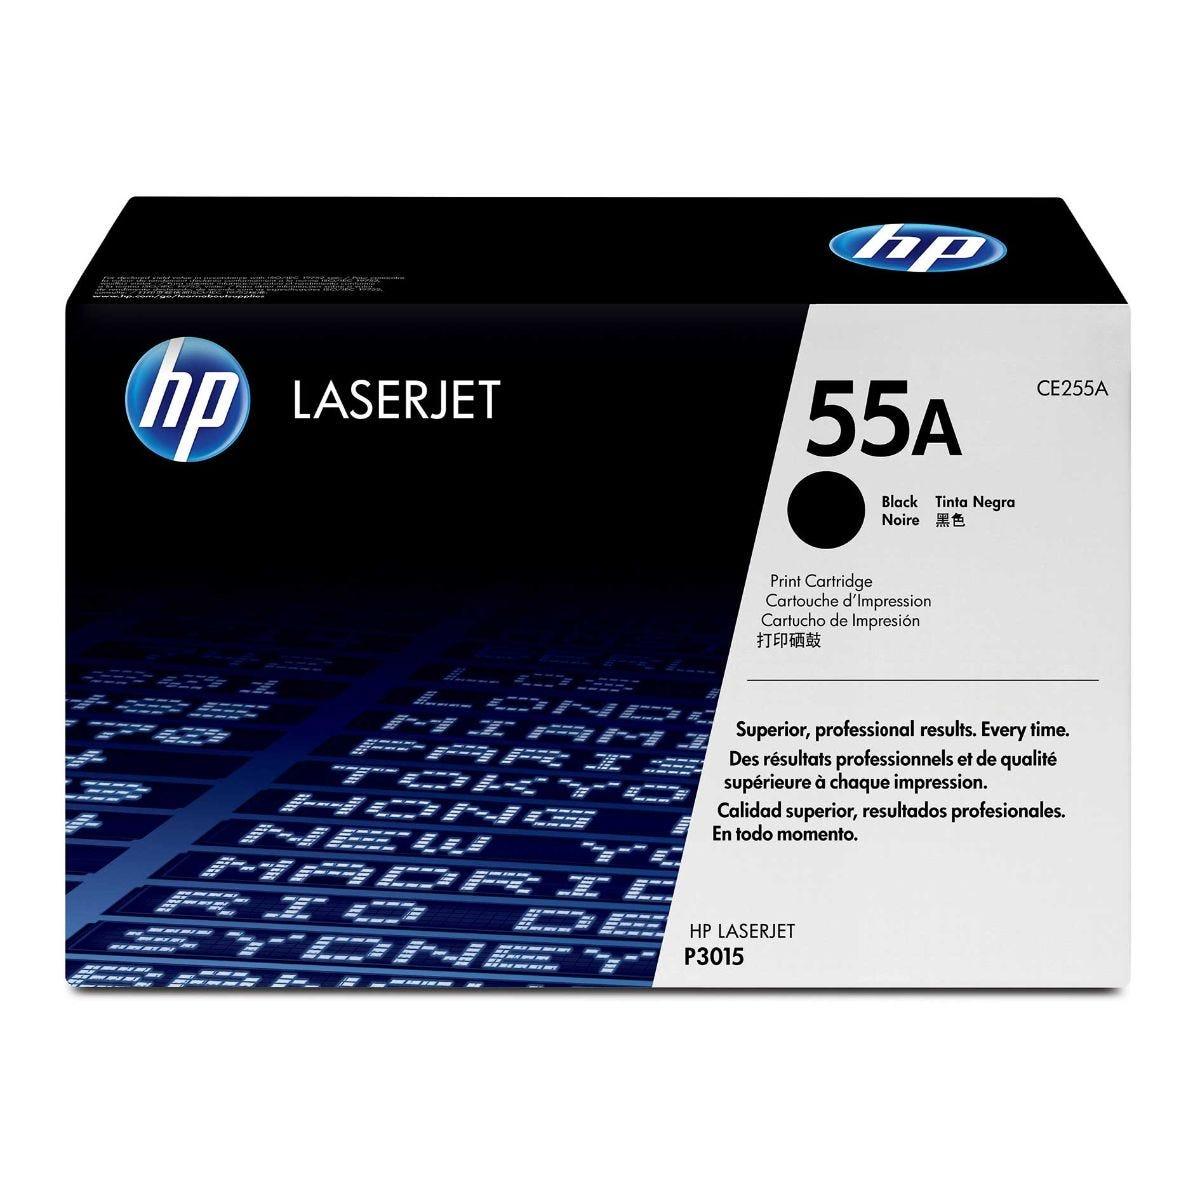 Image of HP 55A Laserjet Printer Ink Toner Cartridge CE255A, Black